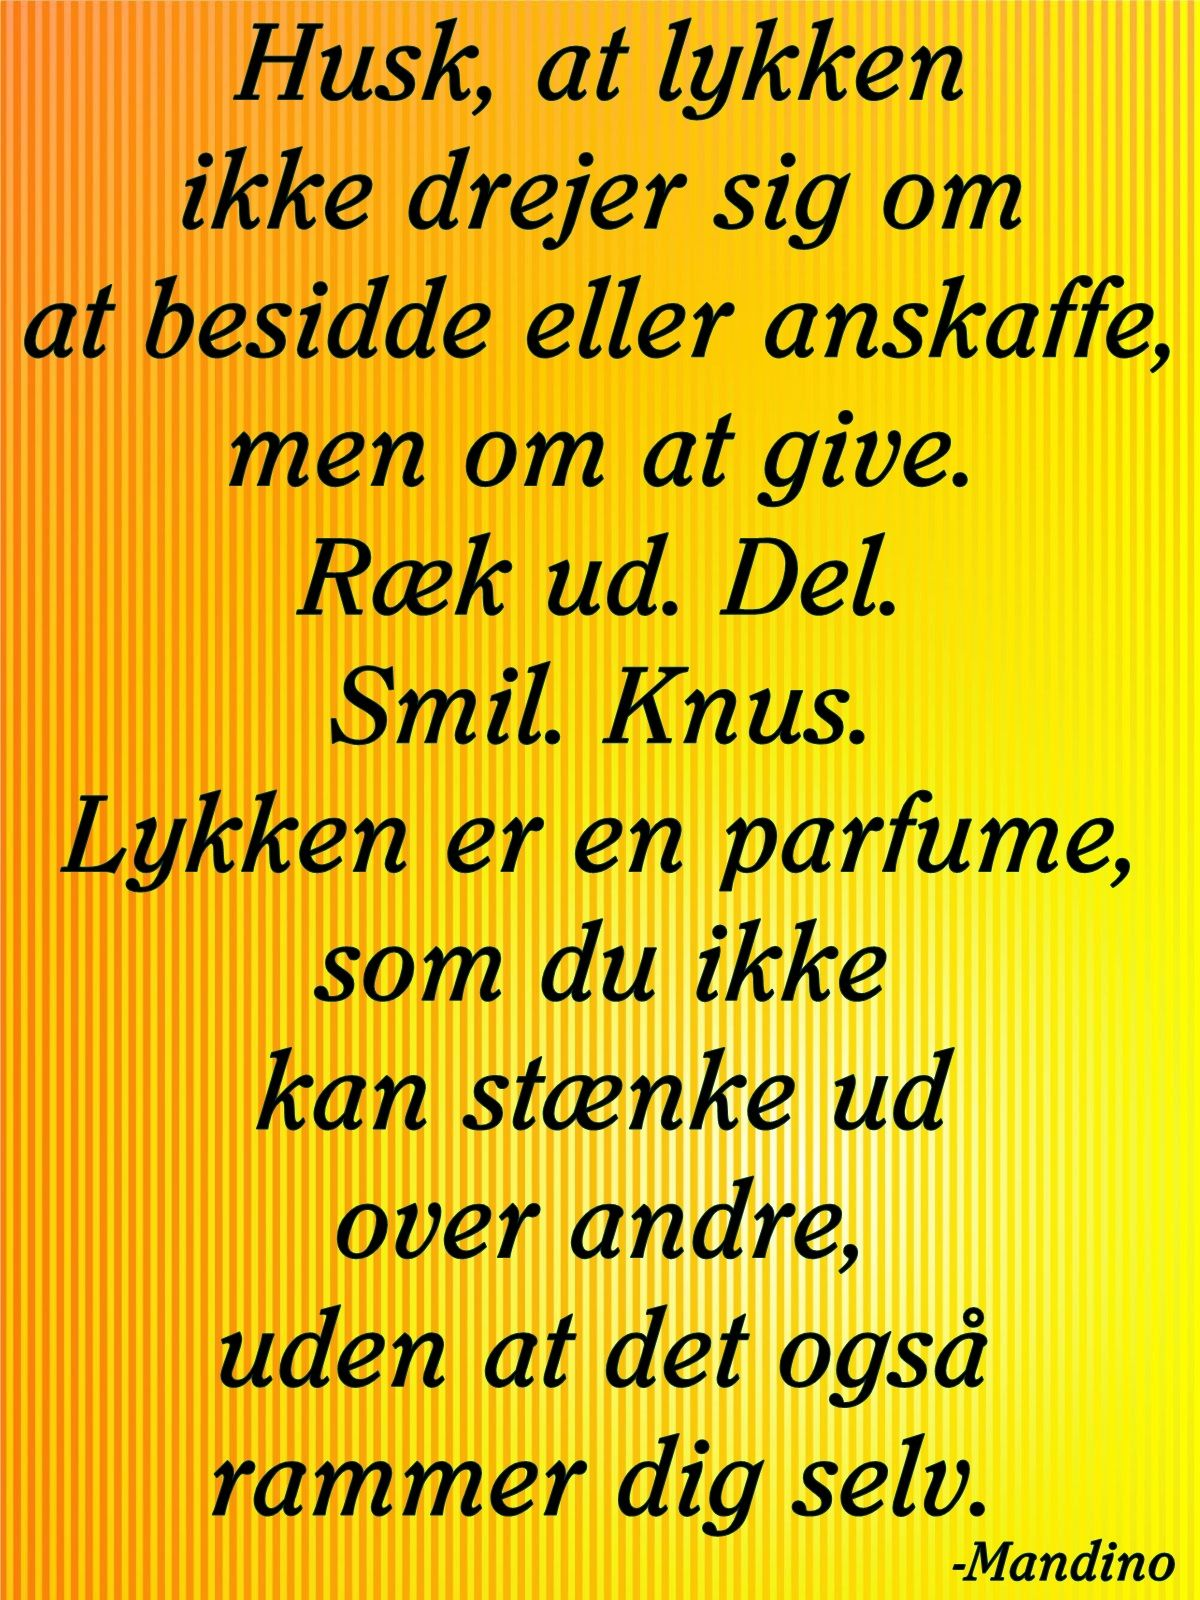 linda p citater citat,dansk,lykke,gavmildhed,   Norwegian   Quotes, Quotations  linda p citater